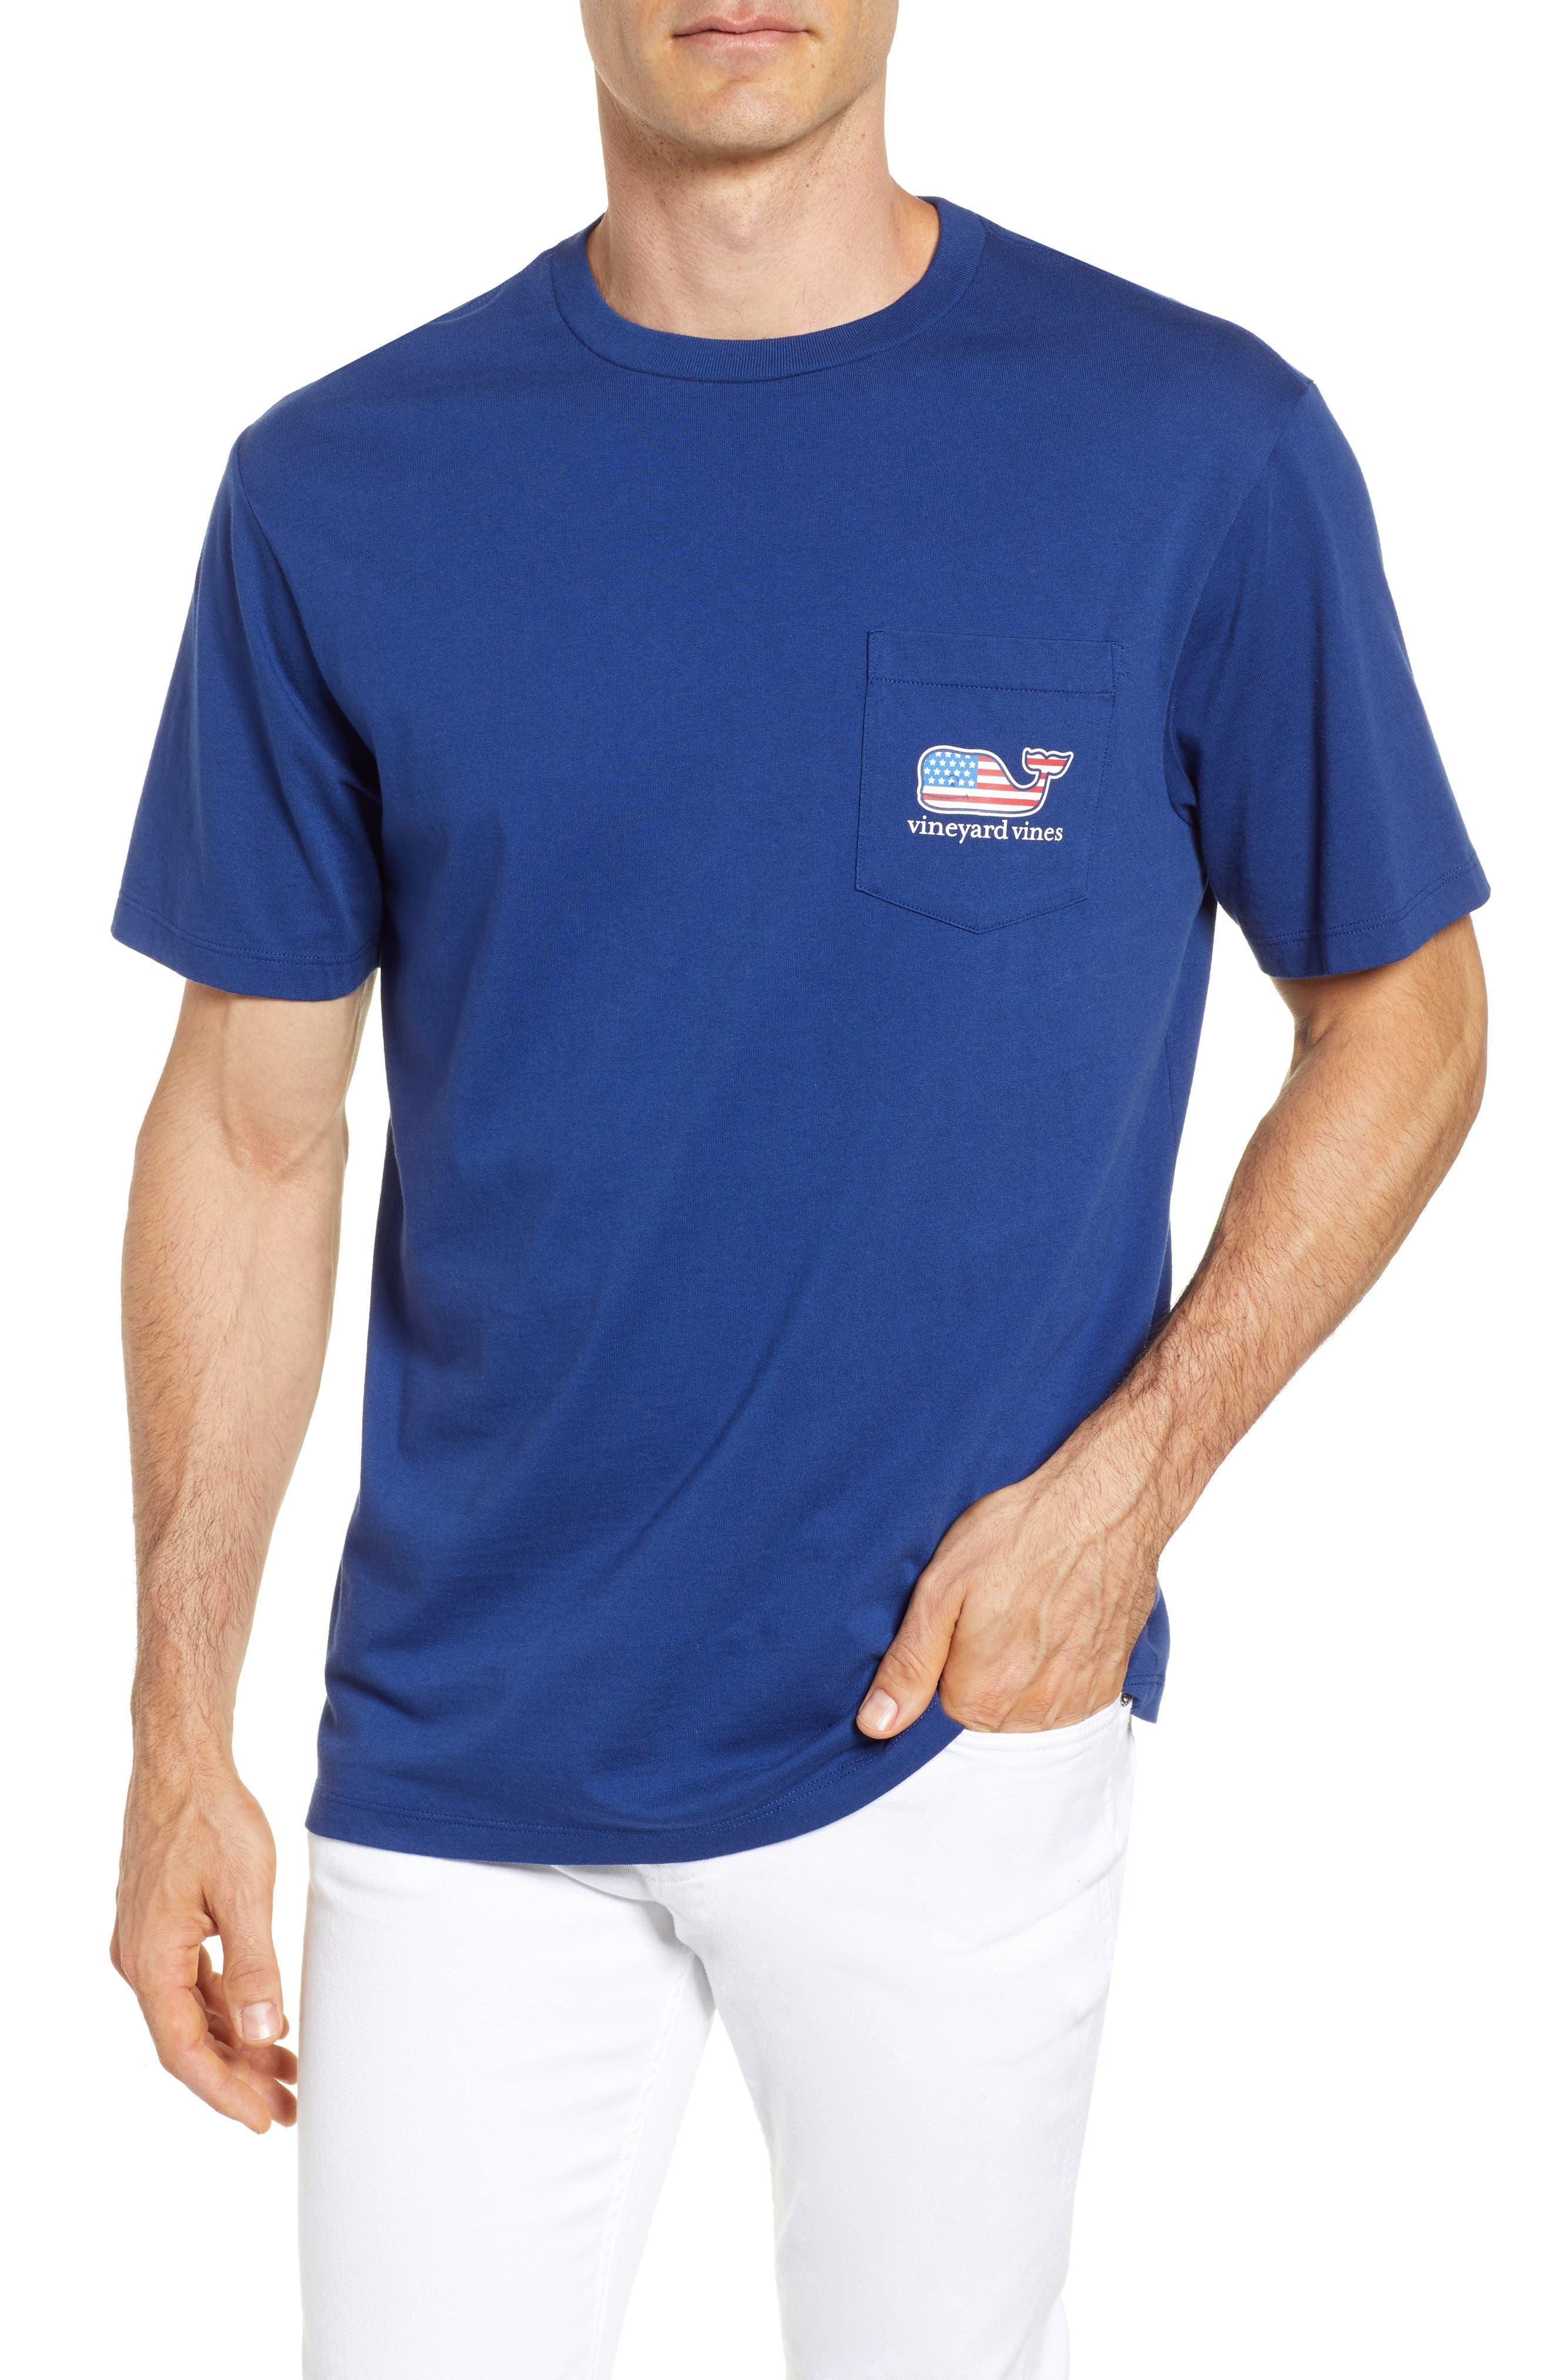 U.S. Tradition Pocket T-Shirt,                             Main thumbnail 1, color,                             Blue Depth